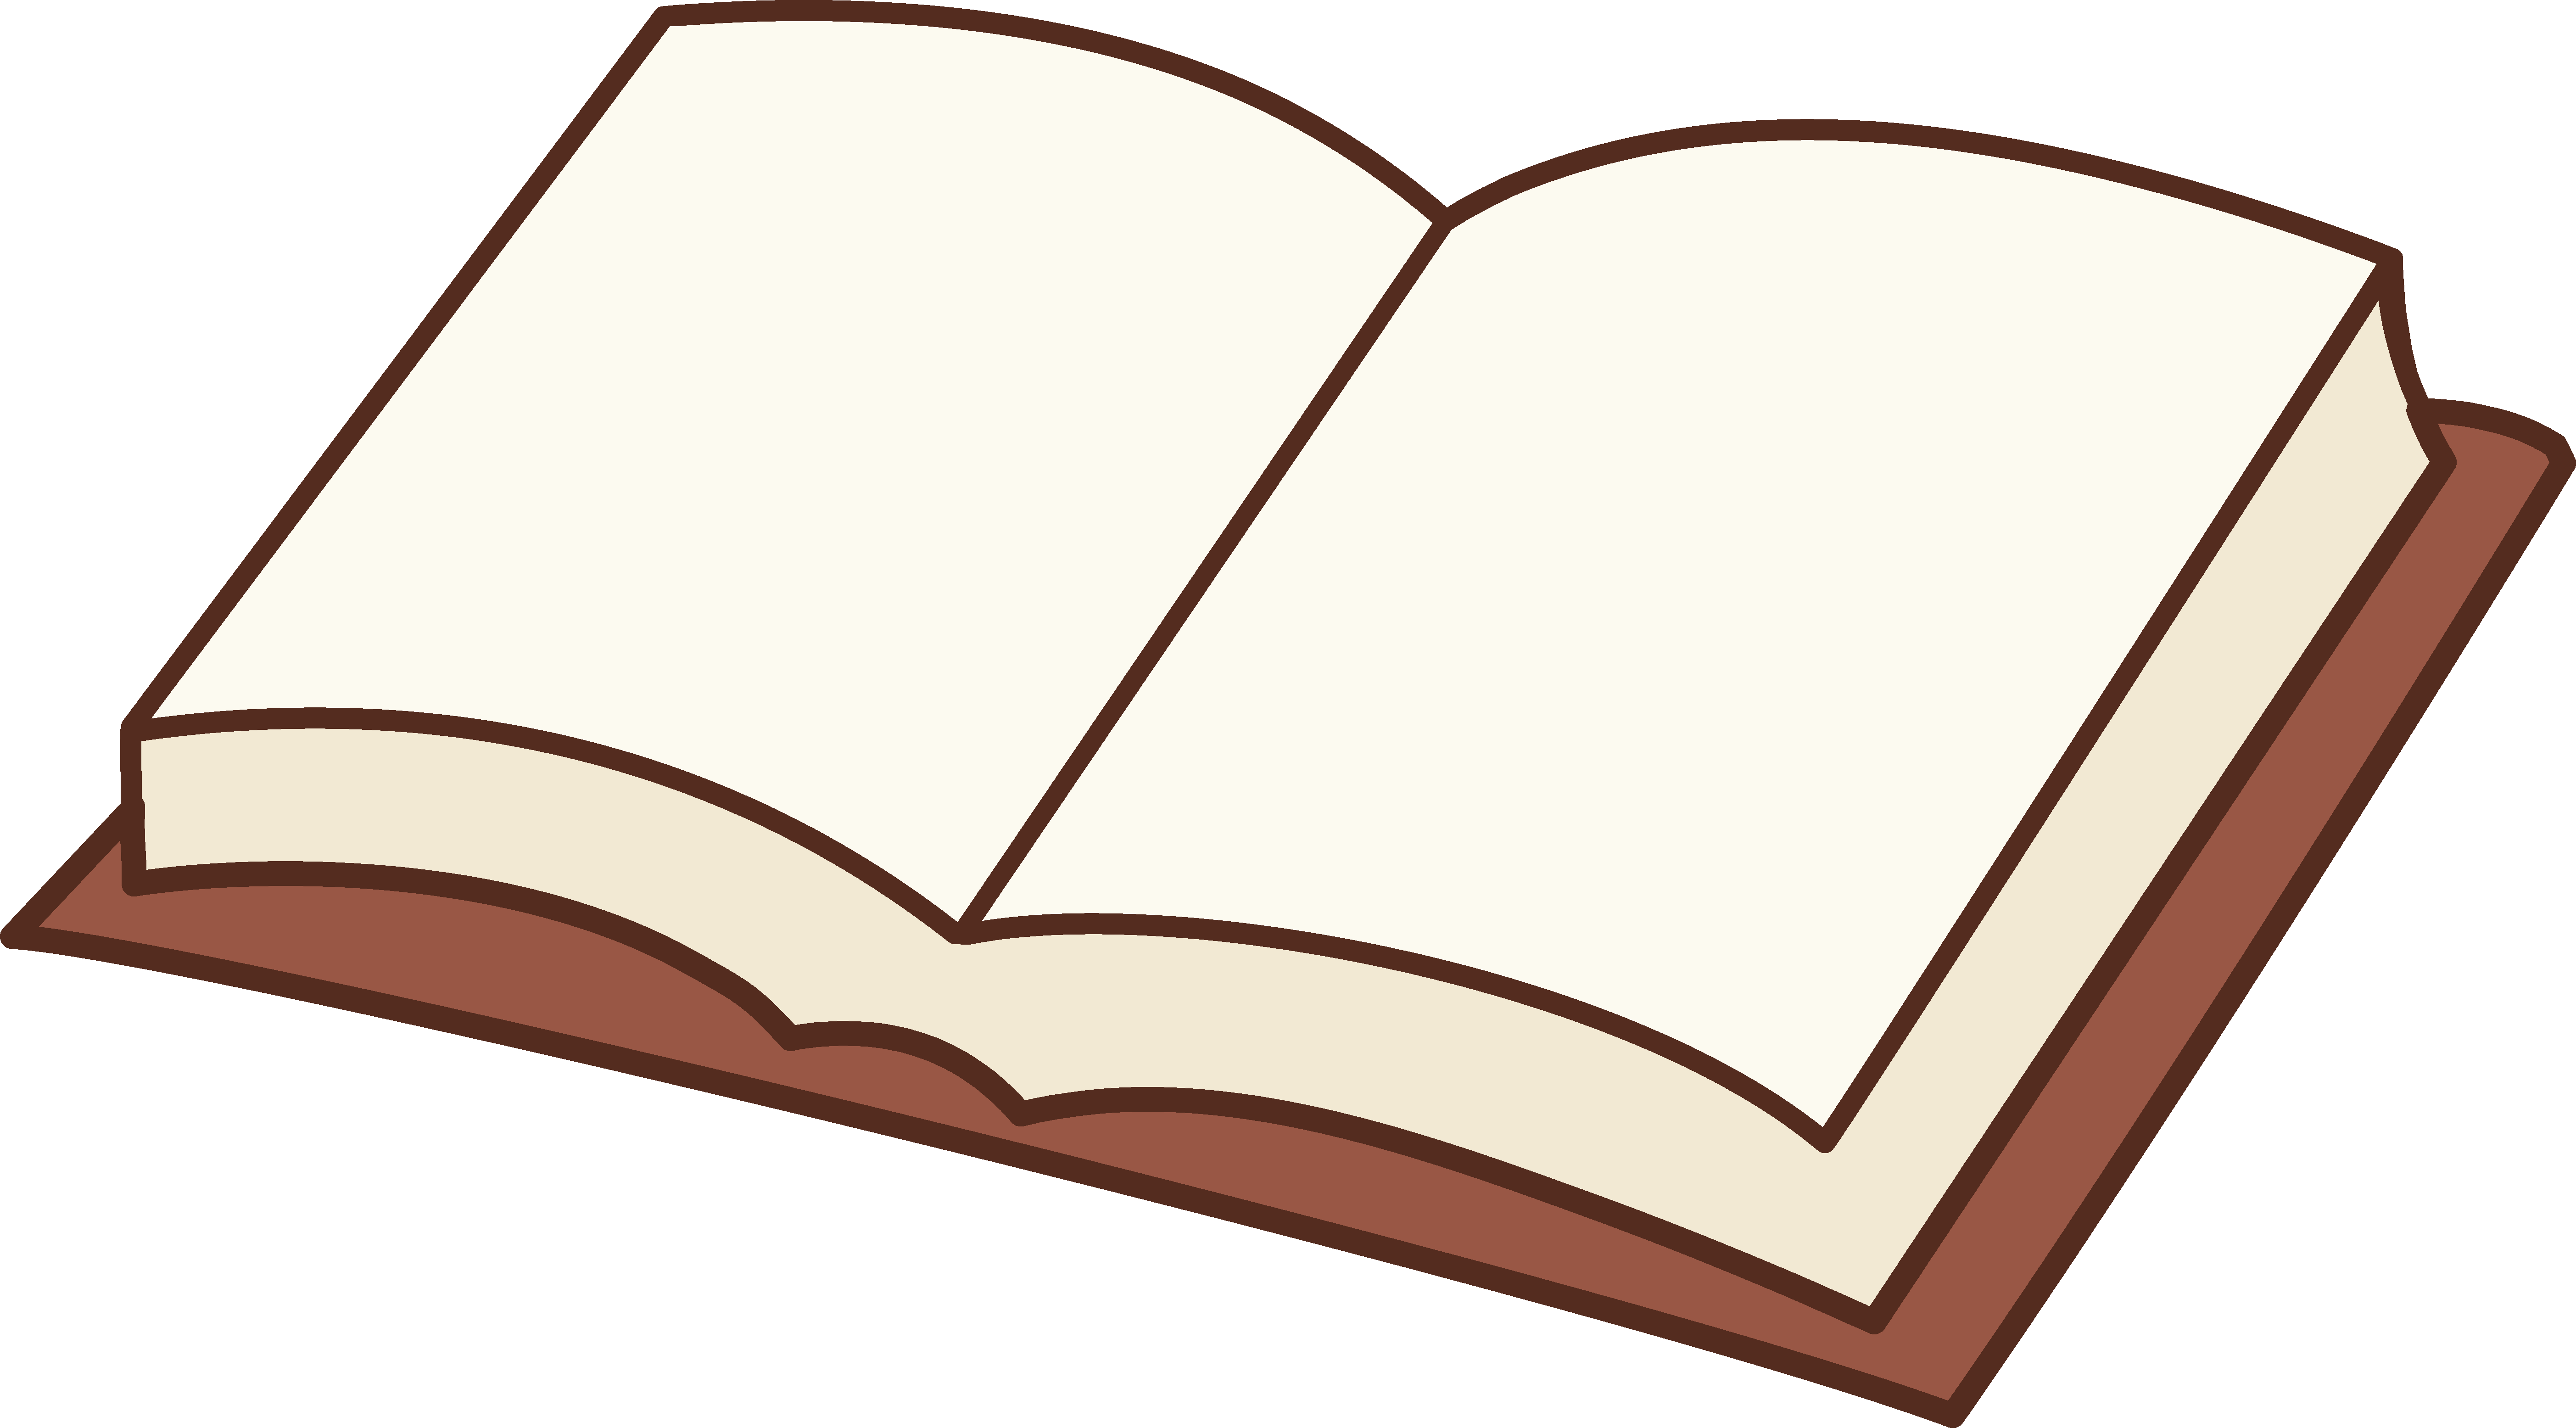 5613x3111 Open Book Clipart Design